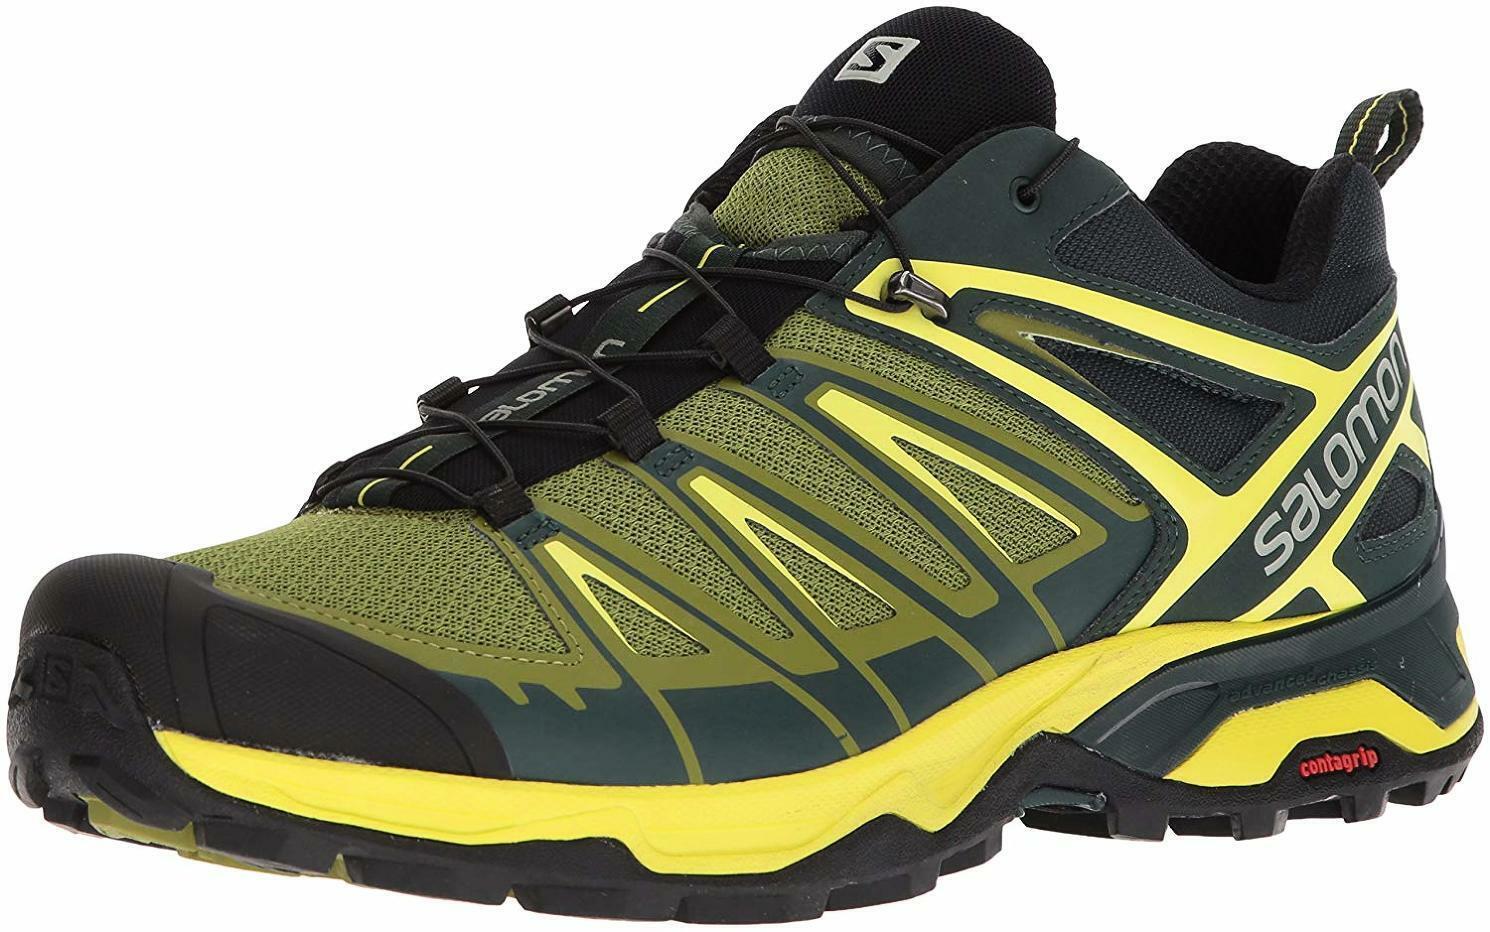 Salomon Men's X Ultra 3 Trail Running scarpe - Choose SZ Coloree